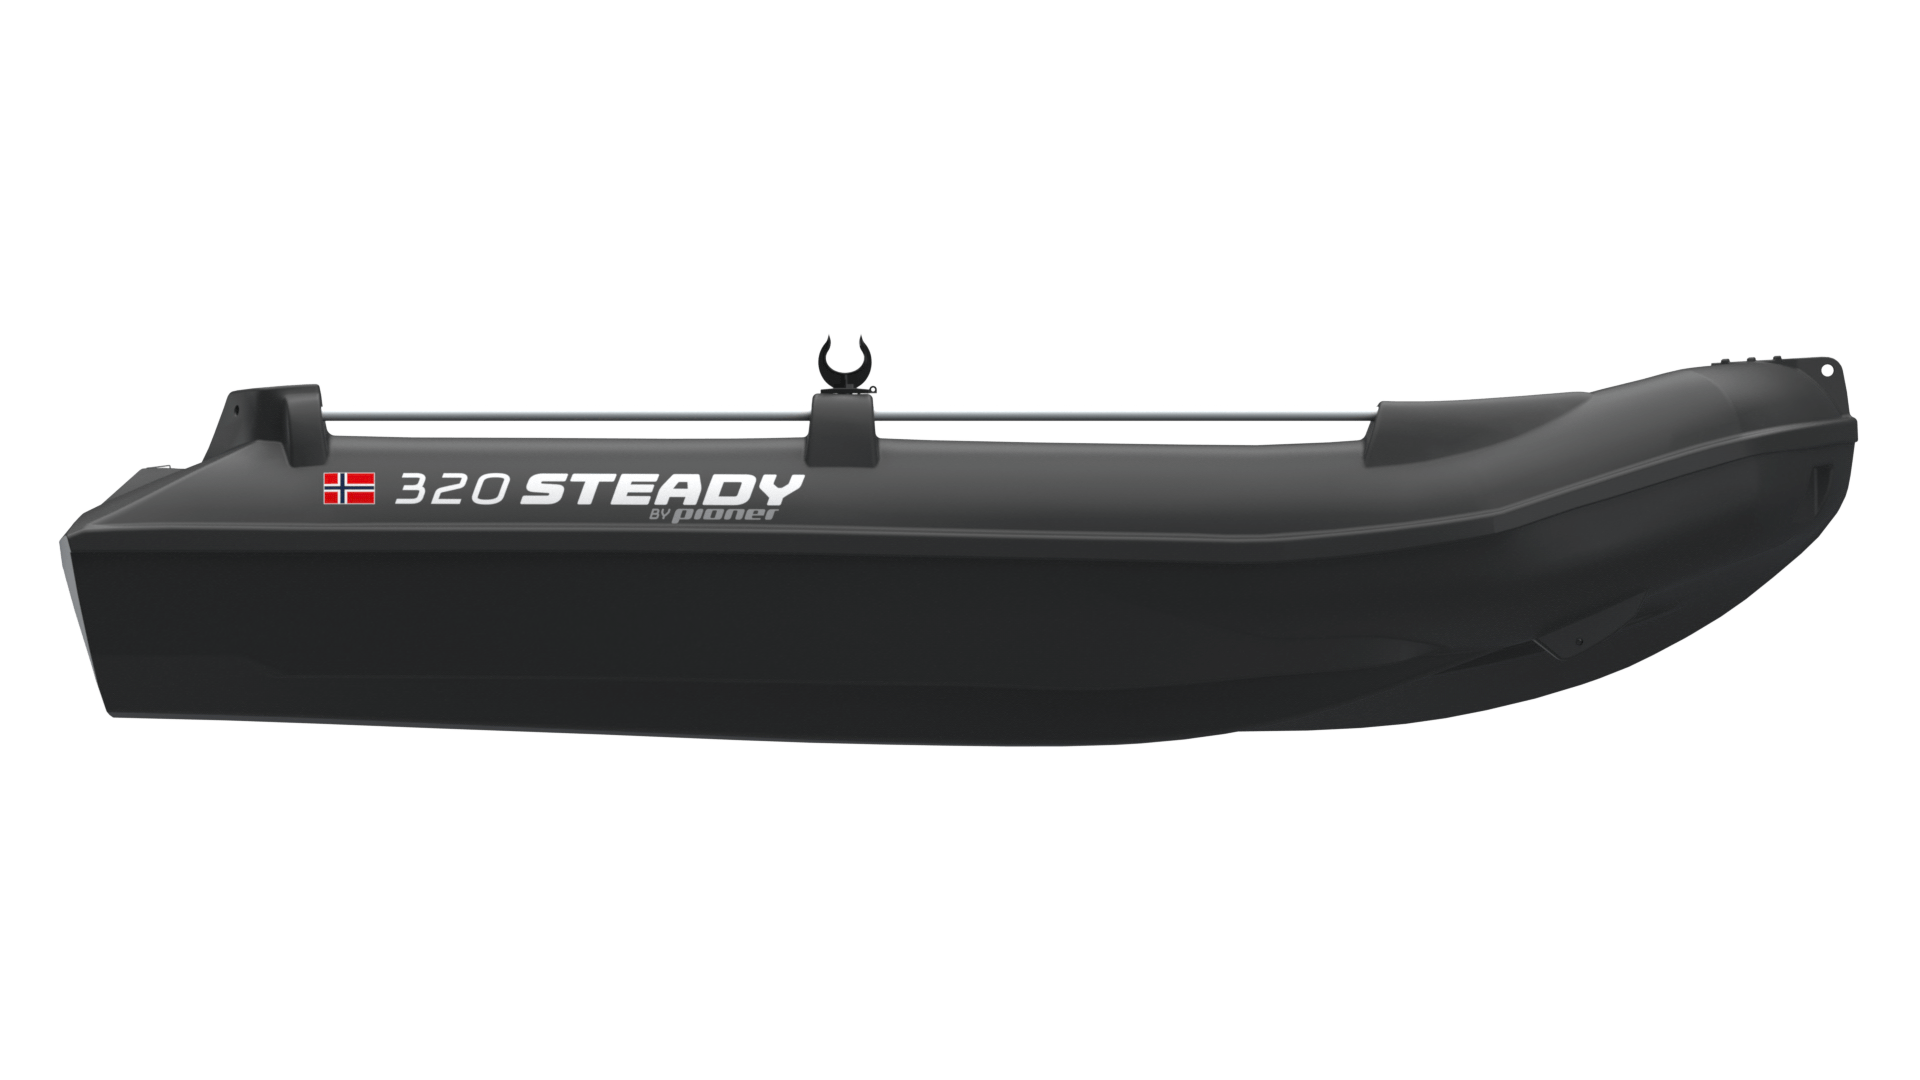 320SbP_grey_Standard_2021_SIDE view_600